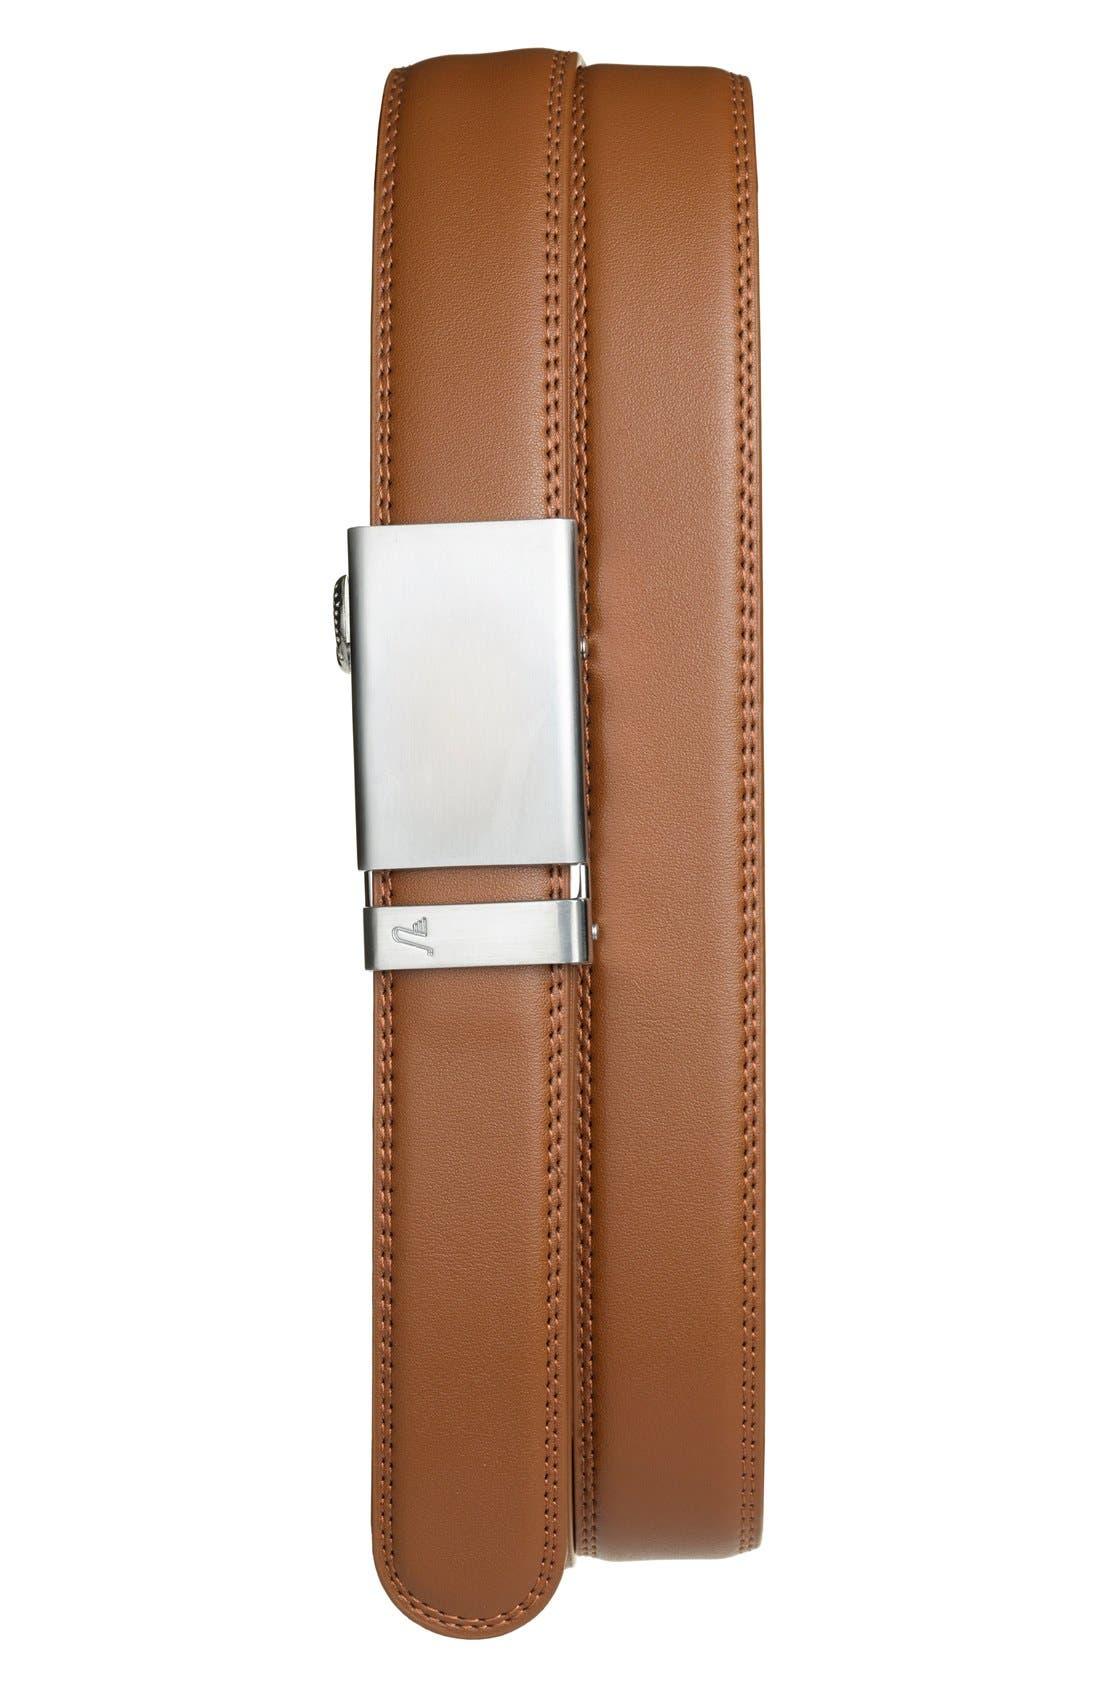 Mission Belt 'Cocoa' Leather Belt